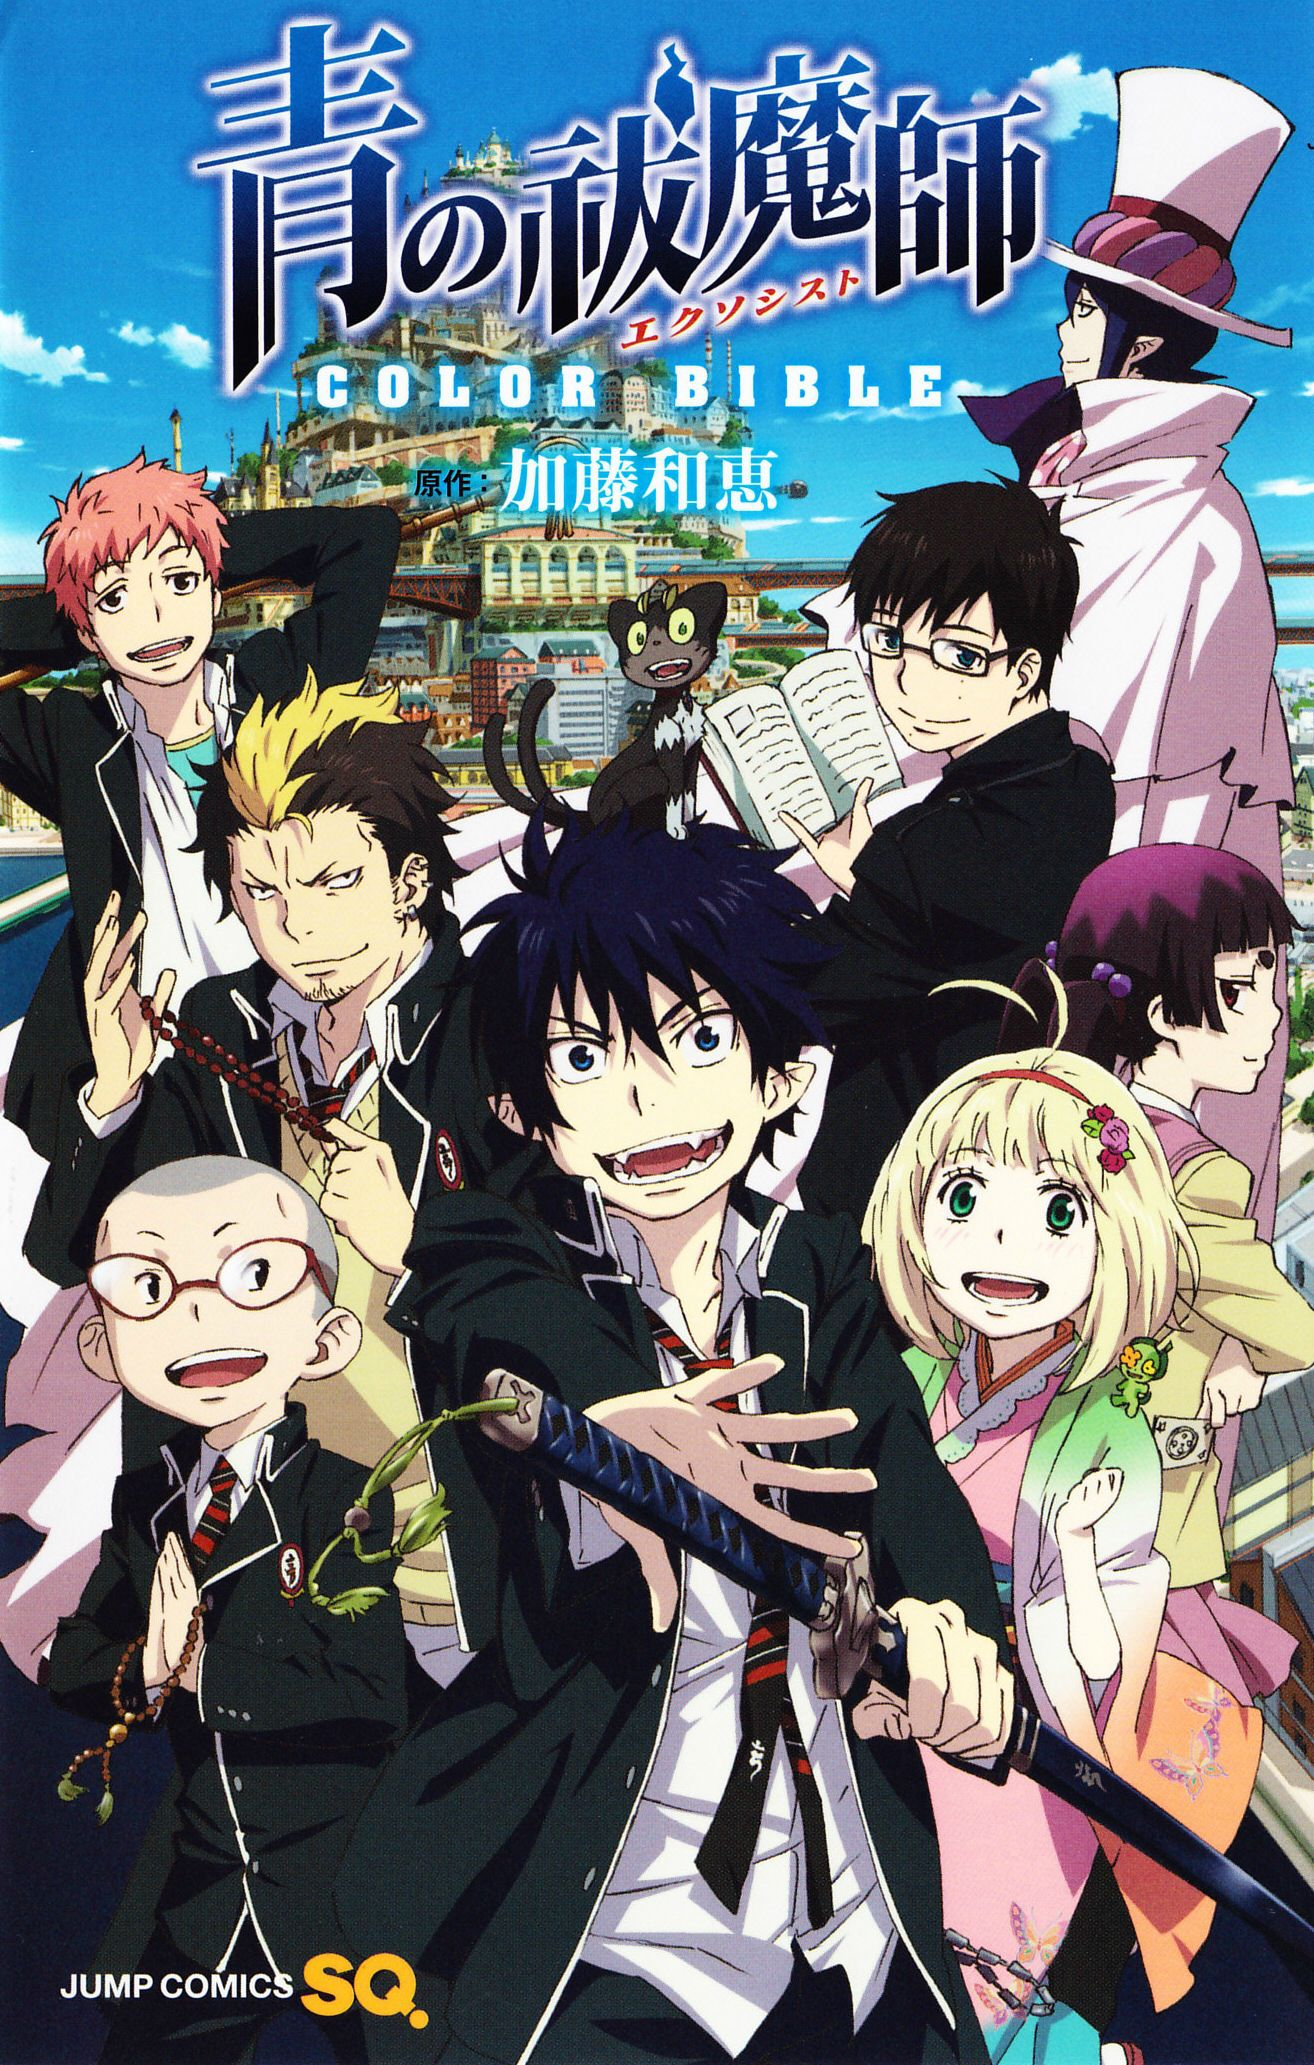 comprar posters anime